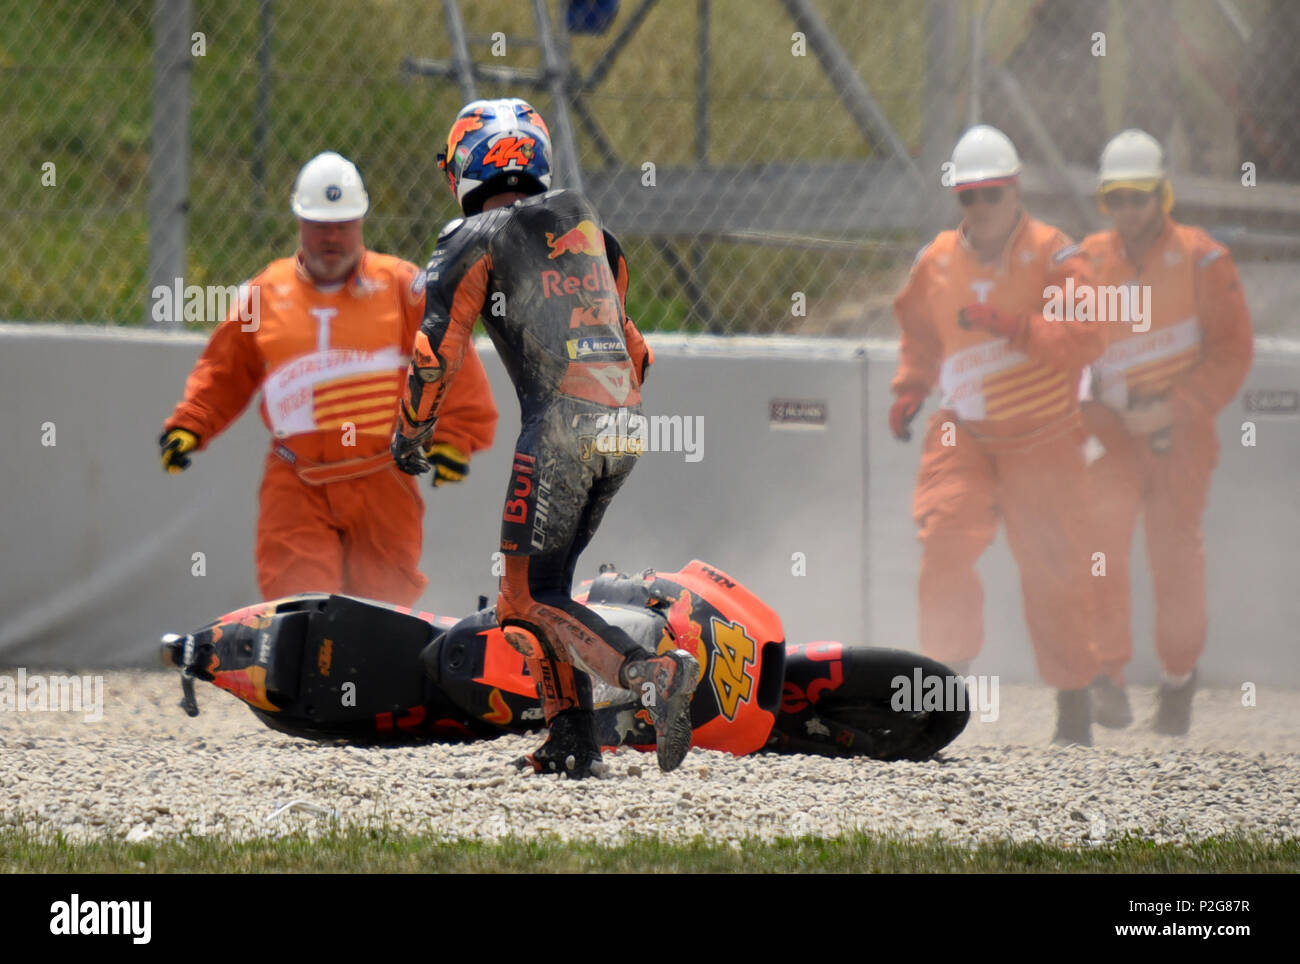 Barcelona -15th June 2018- SPAIN: accident of Pol Espargaro during the free practice of the GP Catalunya Moto GP, in the Barcelona-Catalunya Circuit, on 15th June 2018. Photo: Joan Valls/Urbanandsport/Cordon Press - Stock Image